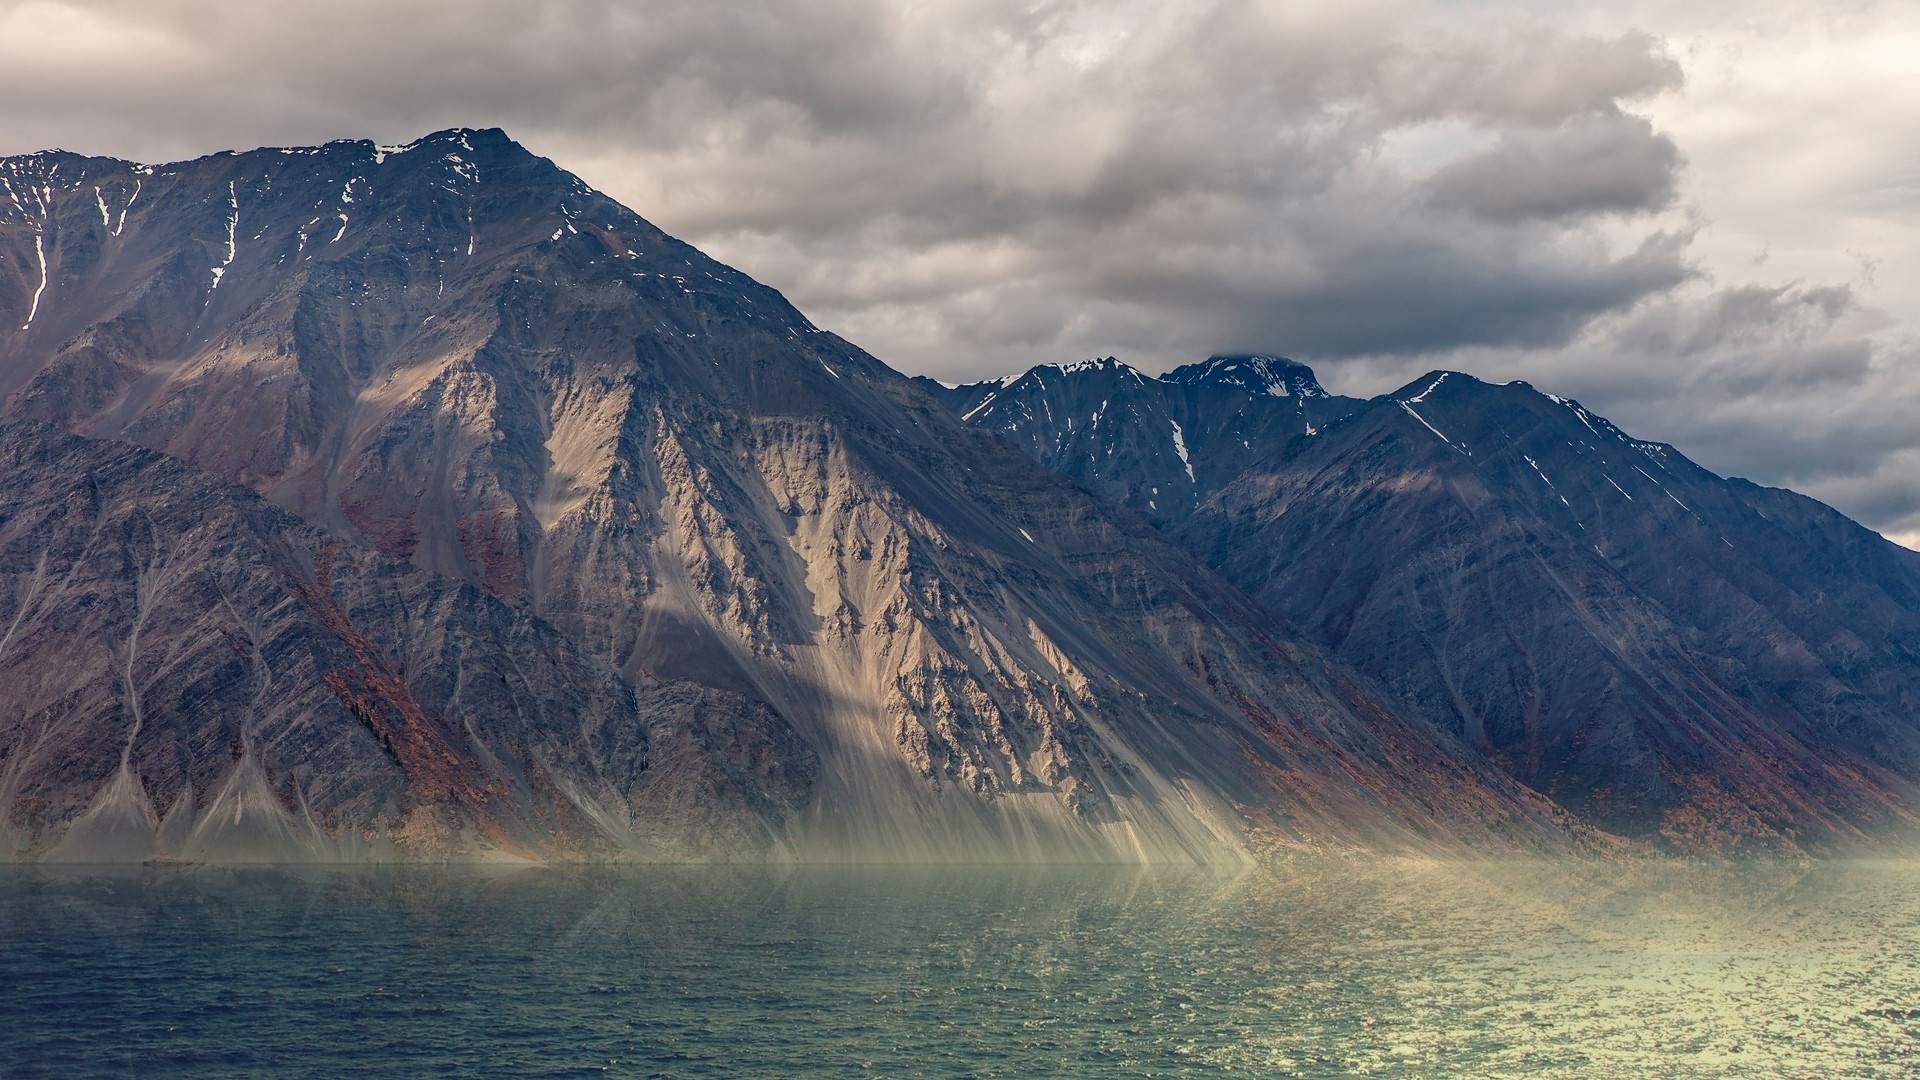 … 1360×768. mountain – Full HD Wallpaper, Photo